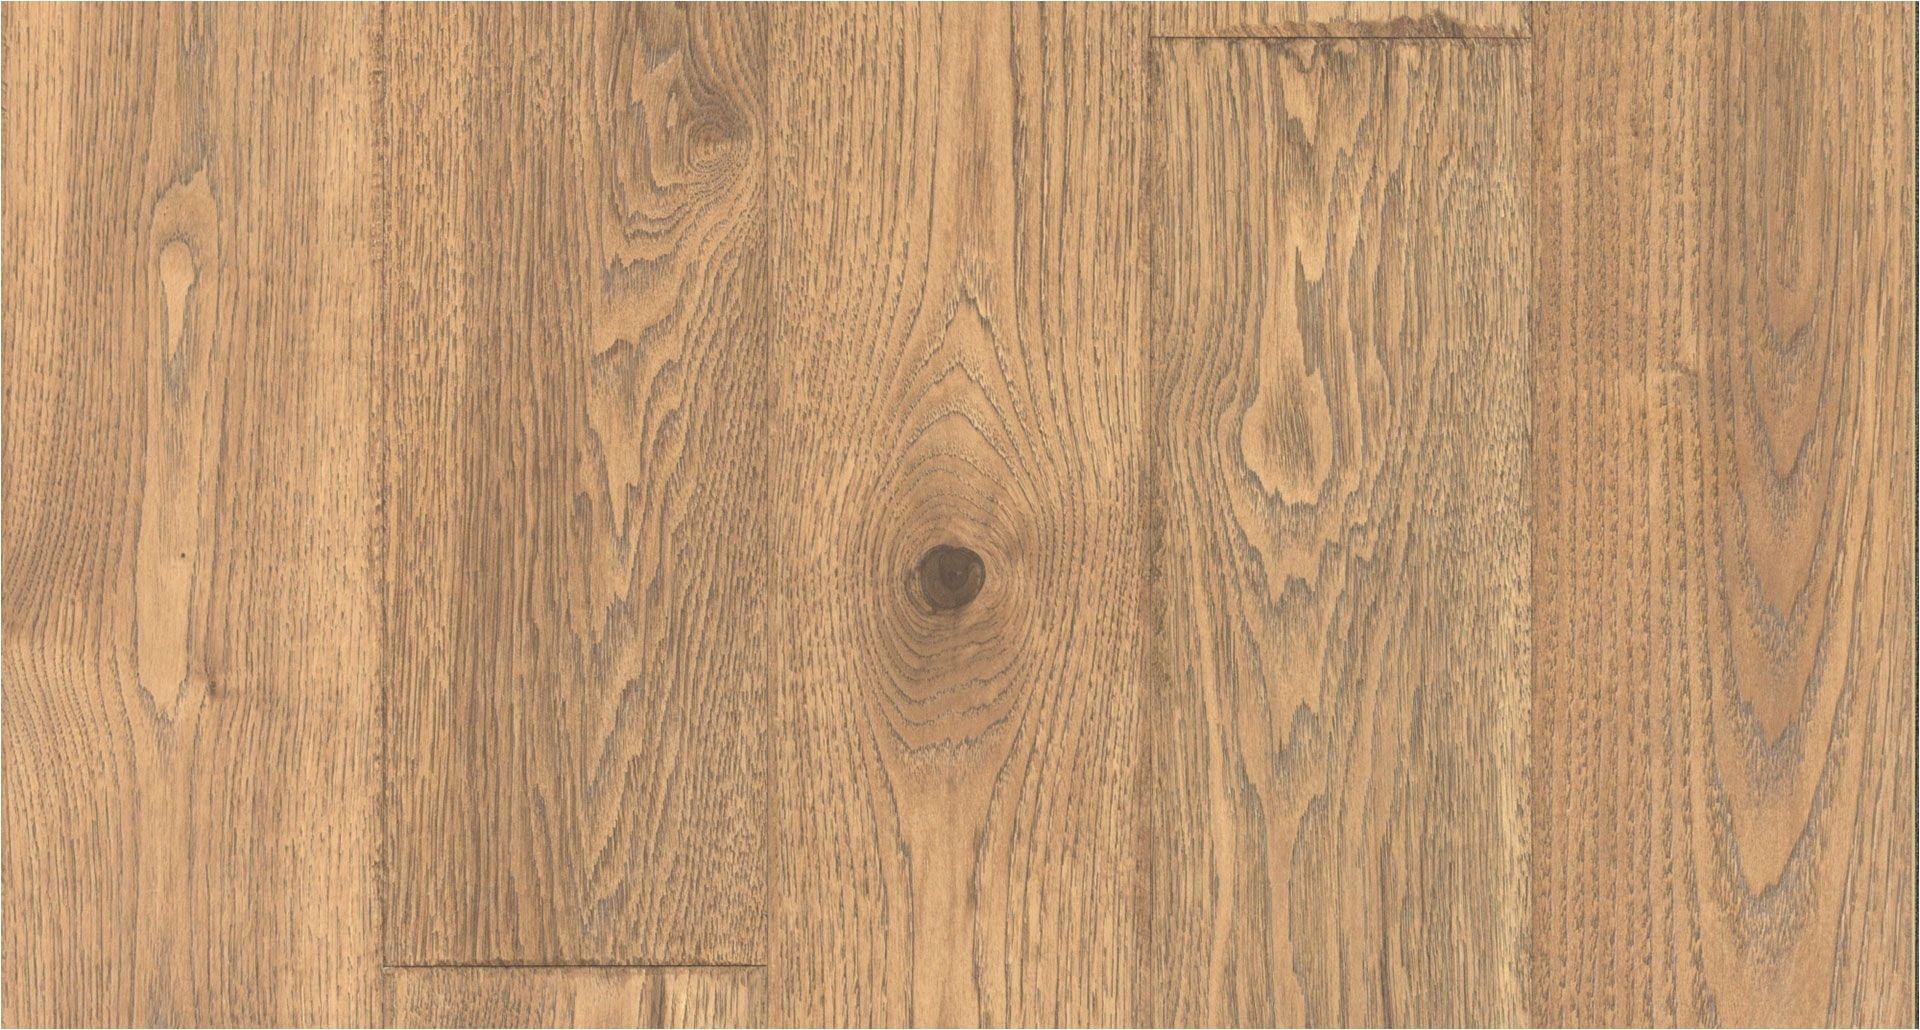 11 Stylish Hardwood Flooring Home Depot